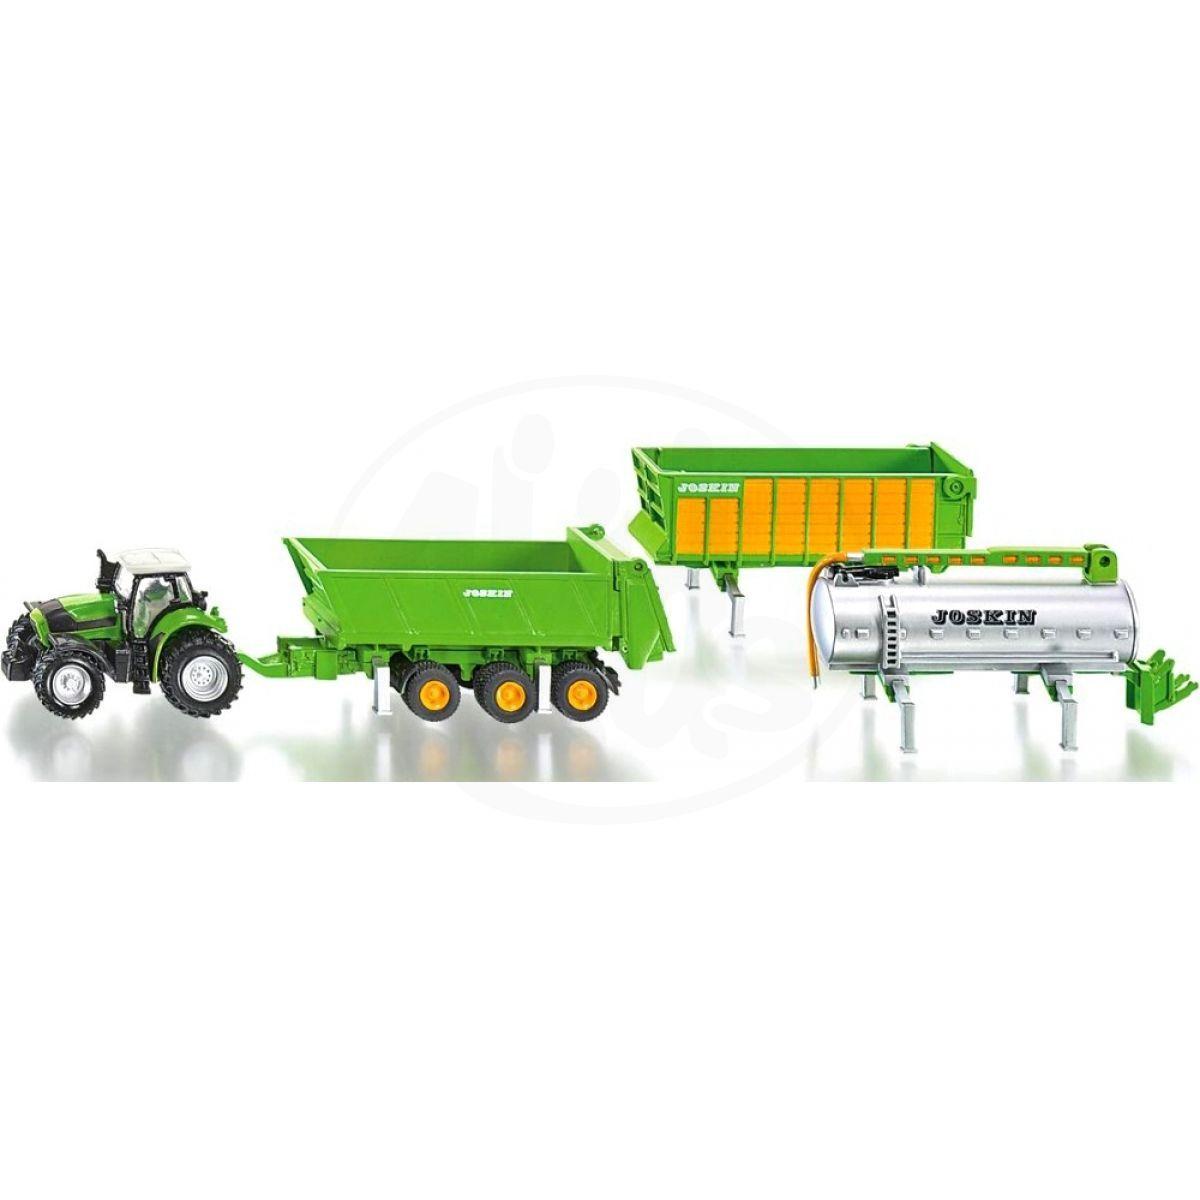 Siku Farmer Traktor Deutz se sadou přívěsů Joskin 1:87